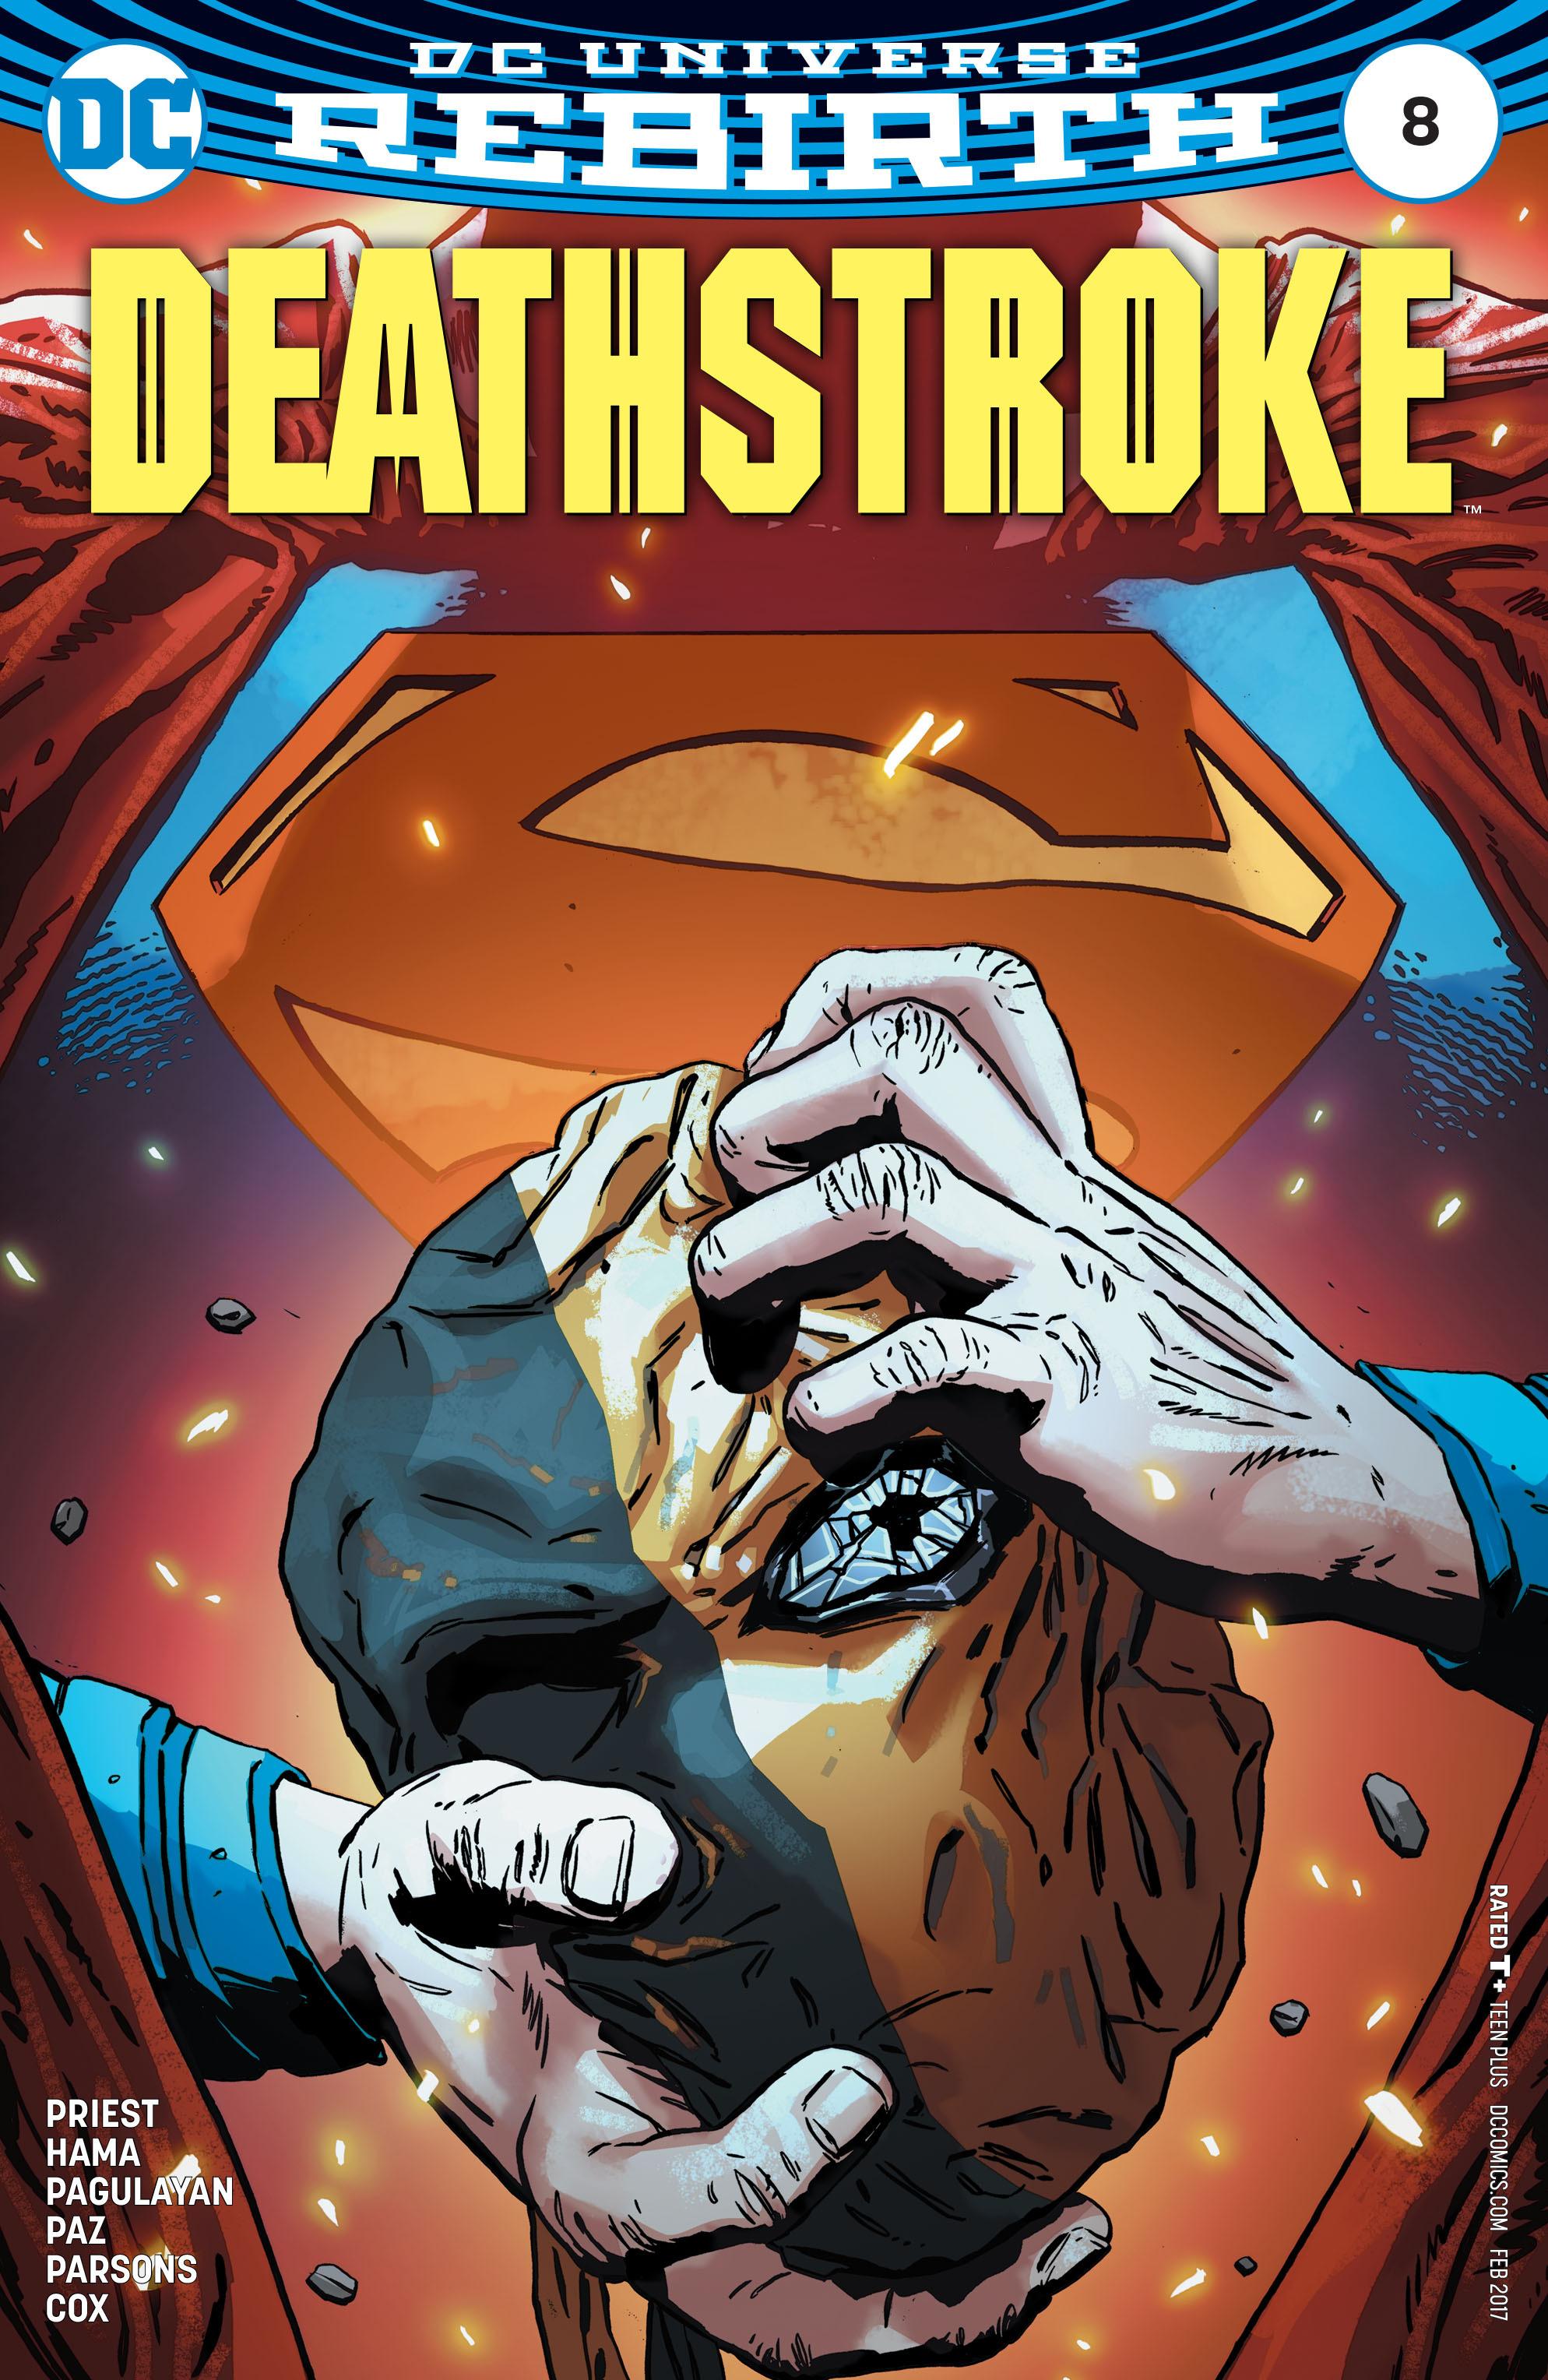 Deathstroke (2016) 8 Page 1